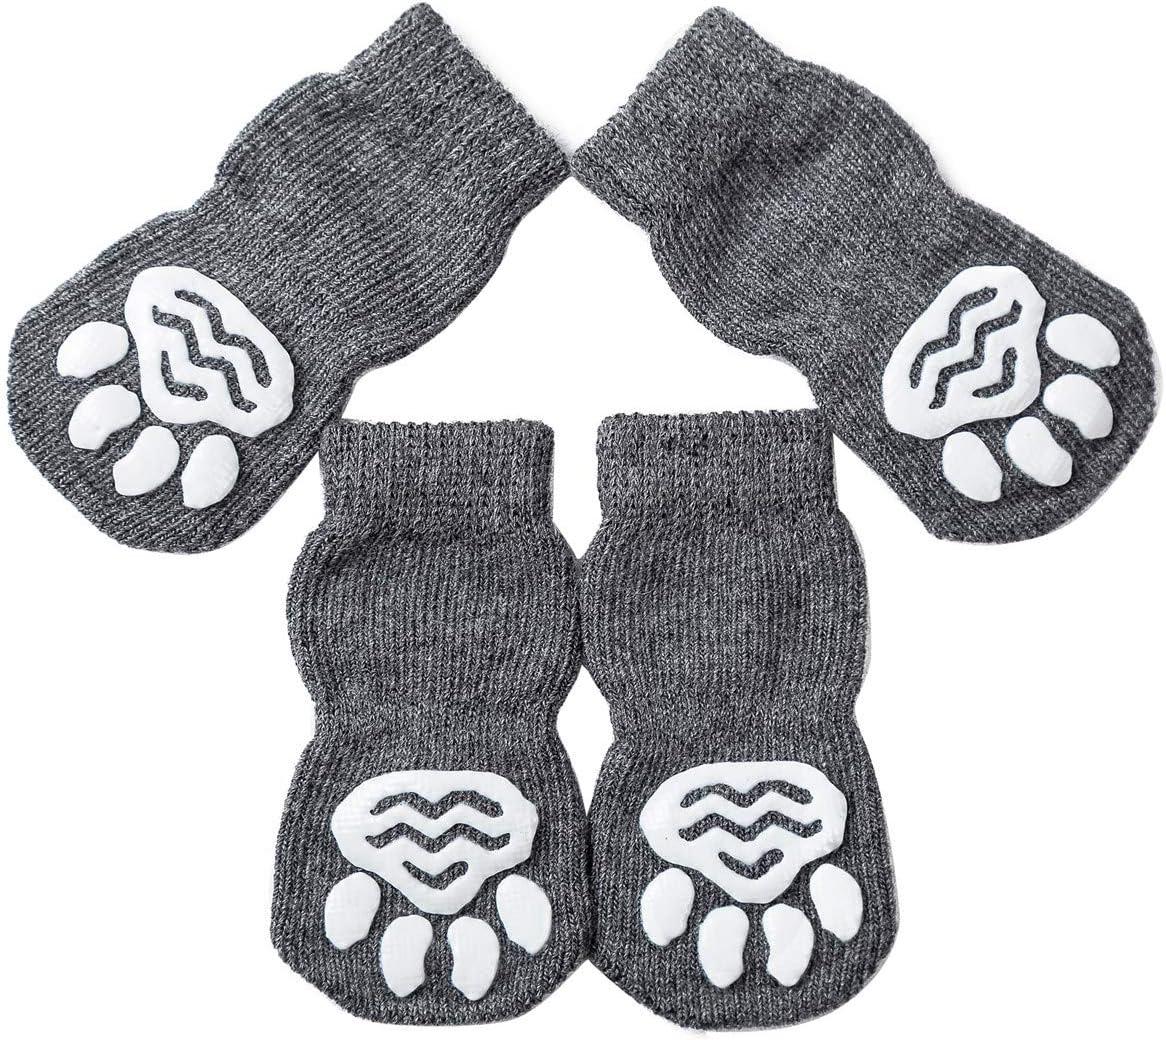 akopawon pcs anti slip pet dog cat sockspaw protectortraction control indoor wear